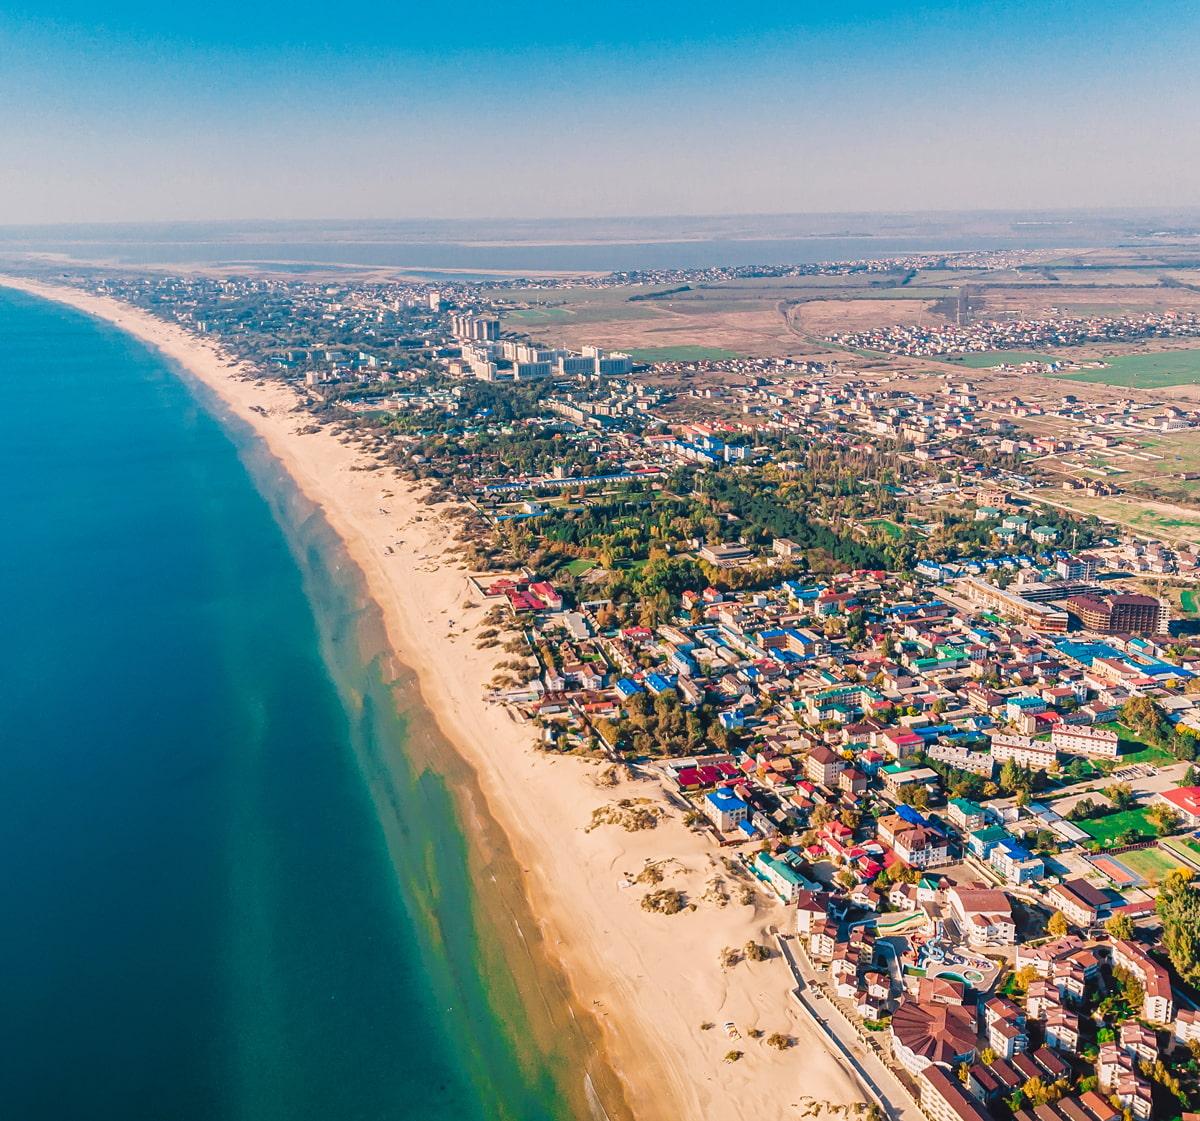 Beach town in Russia